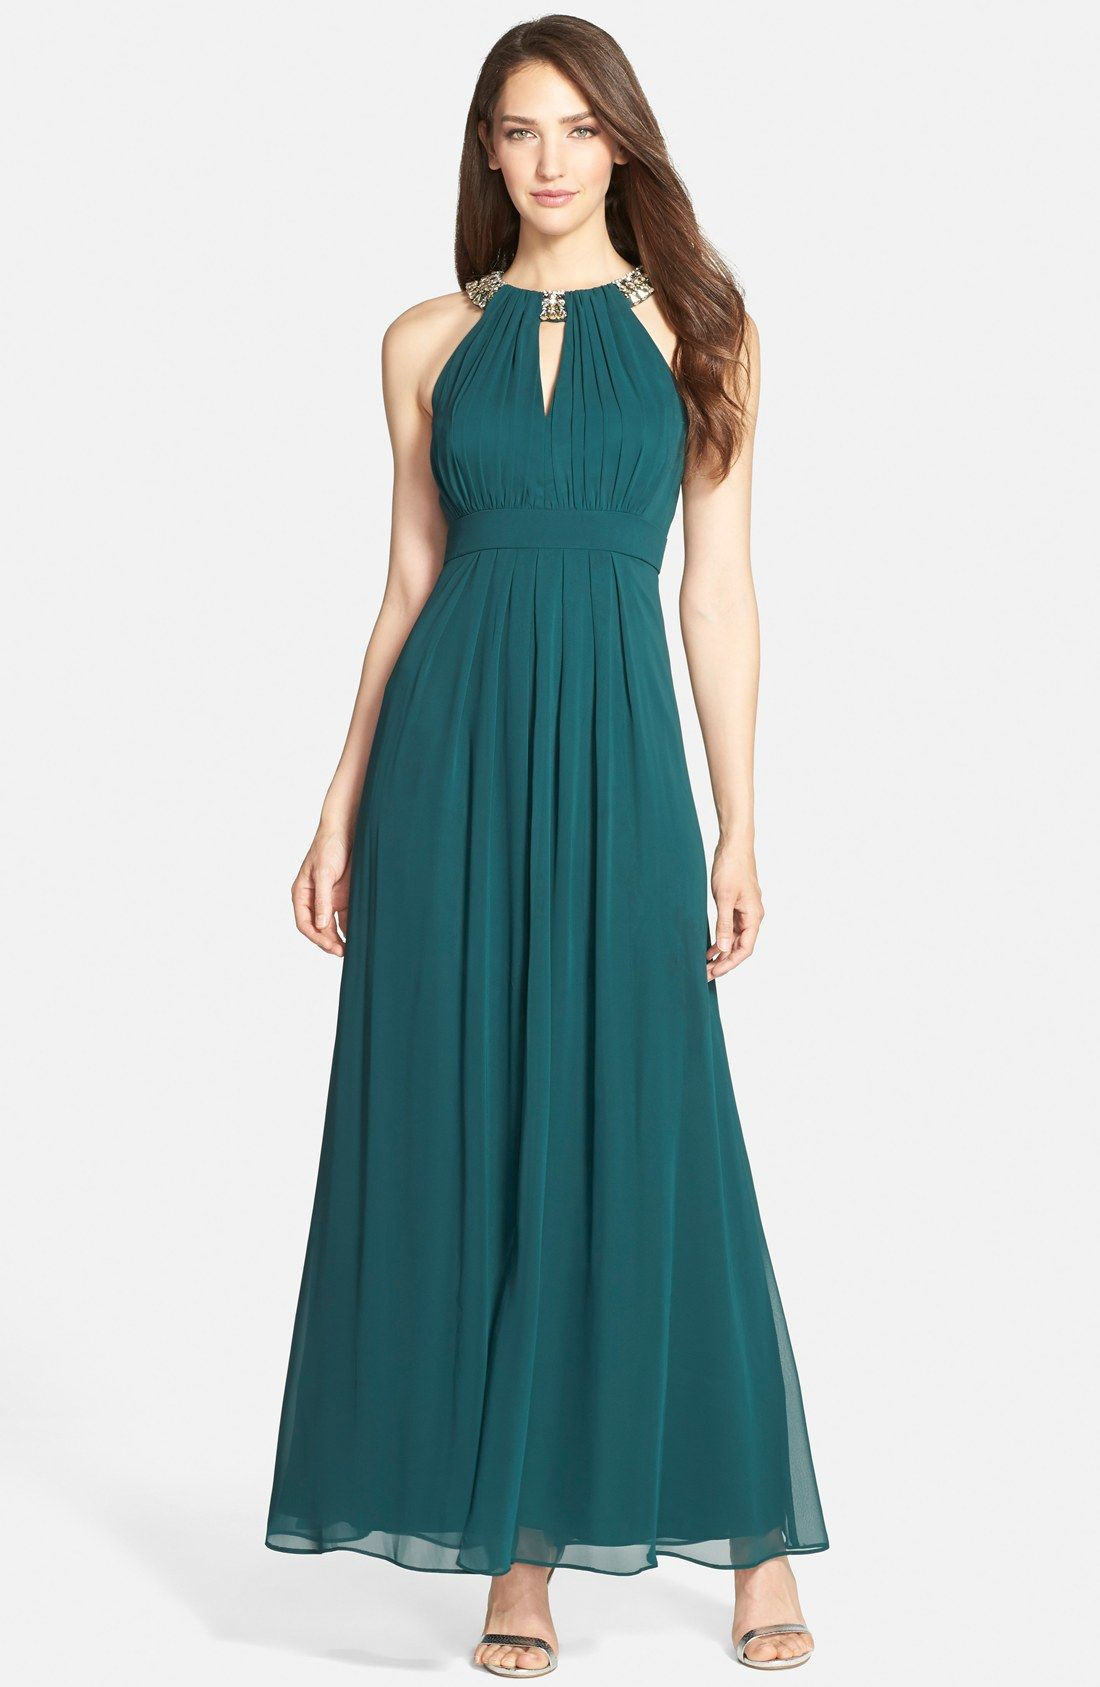 Eliza J Embellished Chiffon Fit & Flare Gown | dress | Pinterest ...